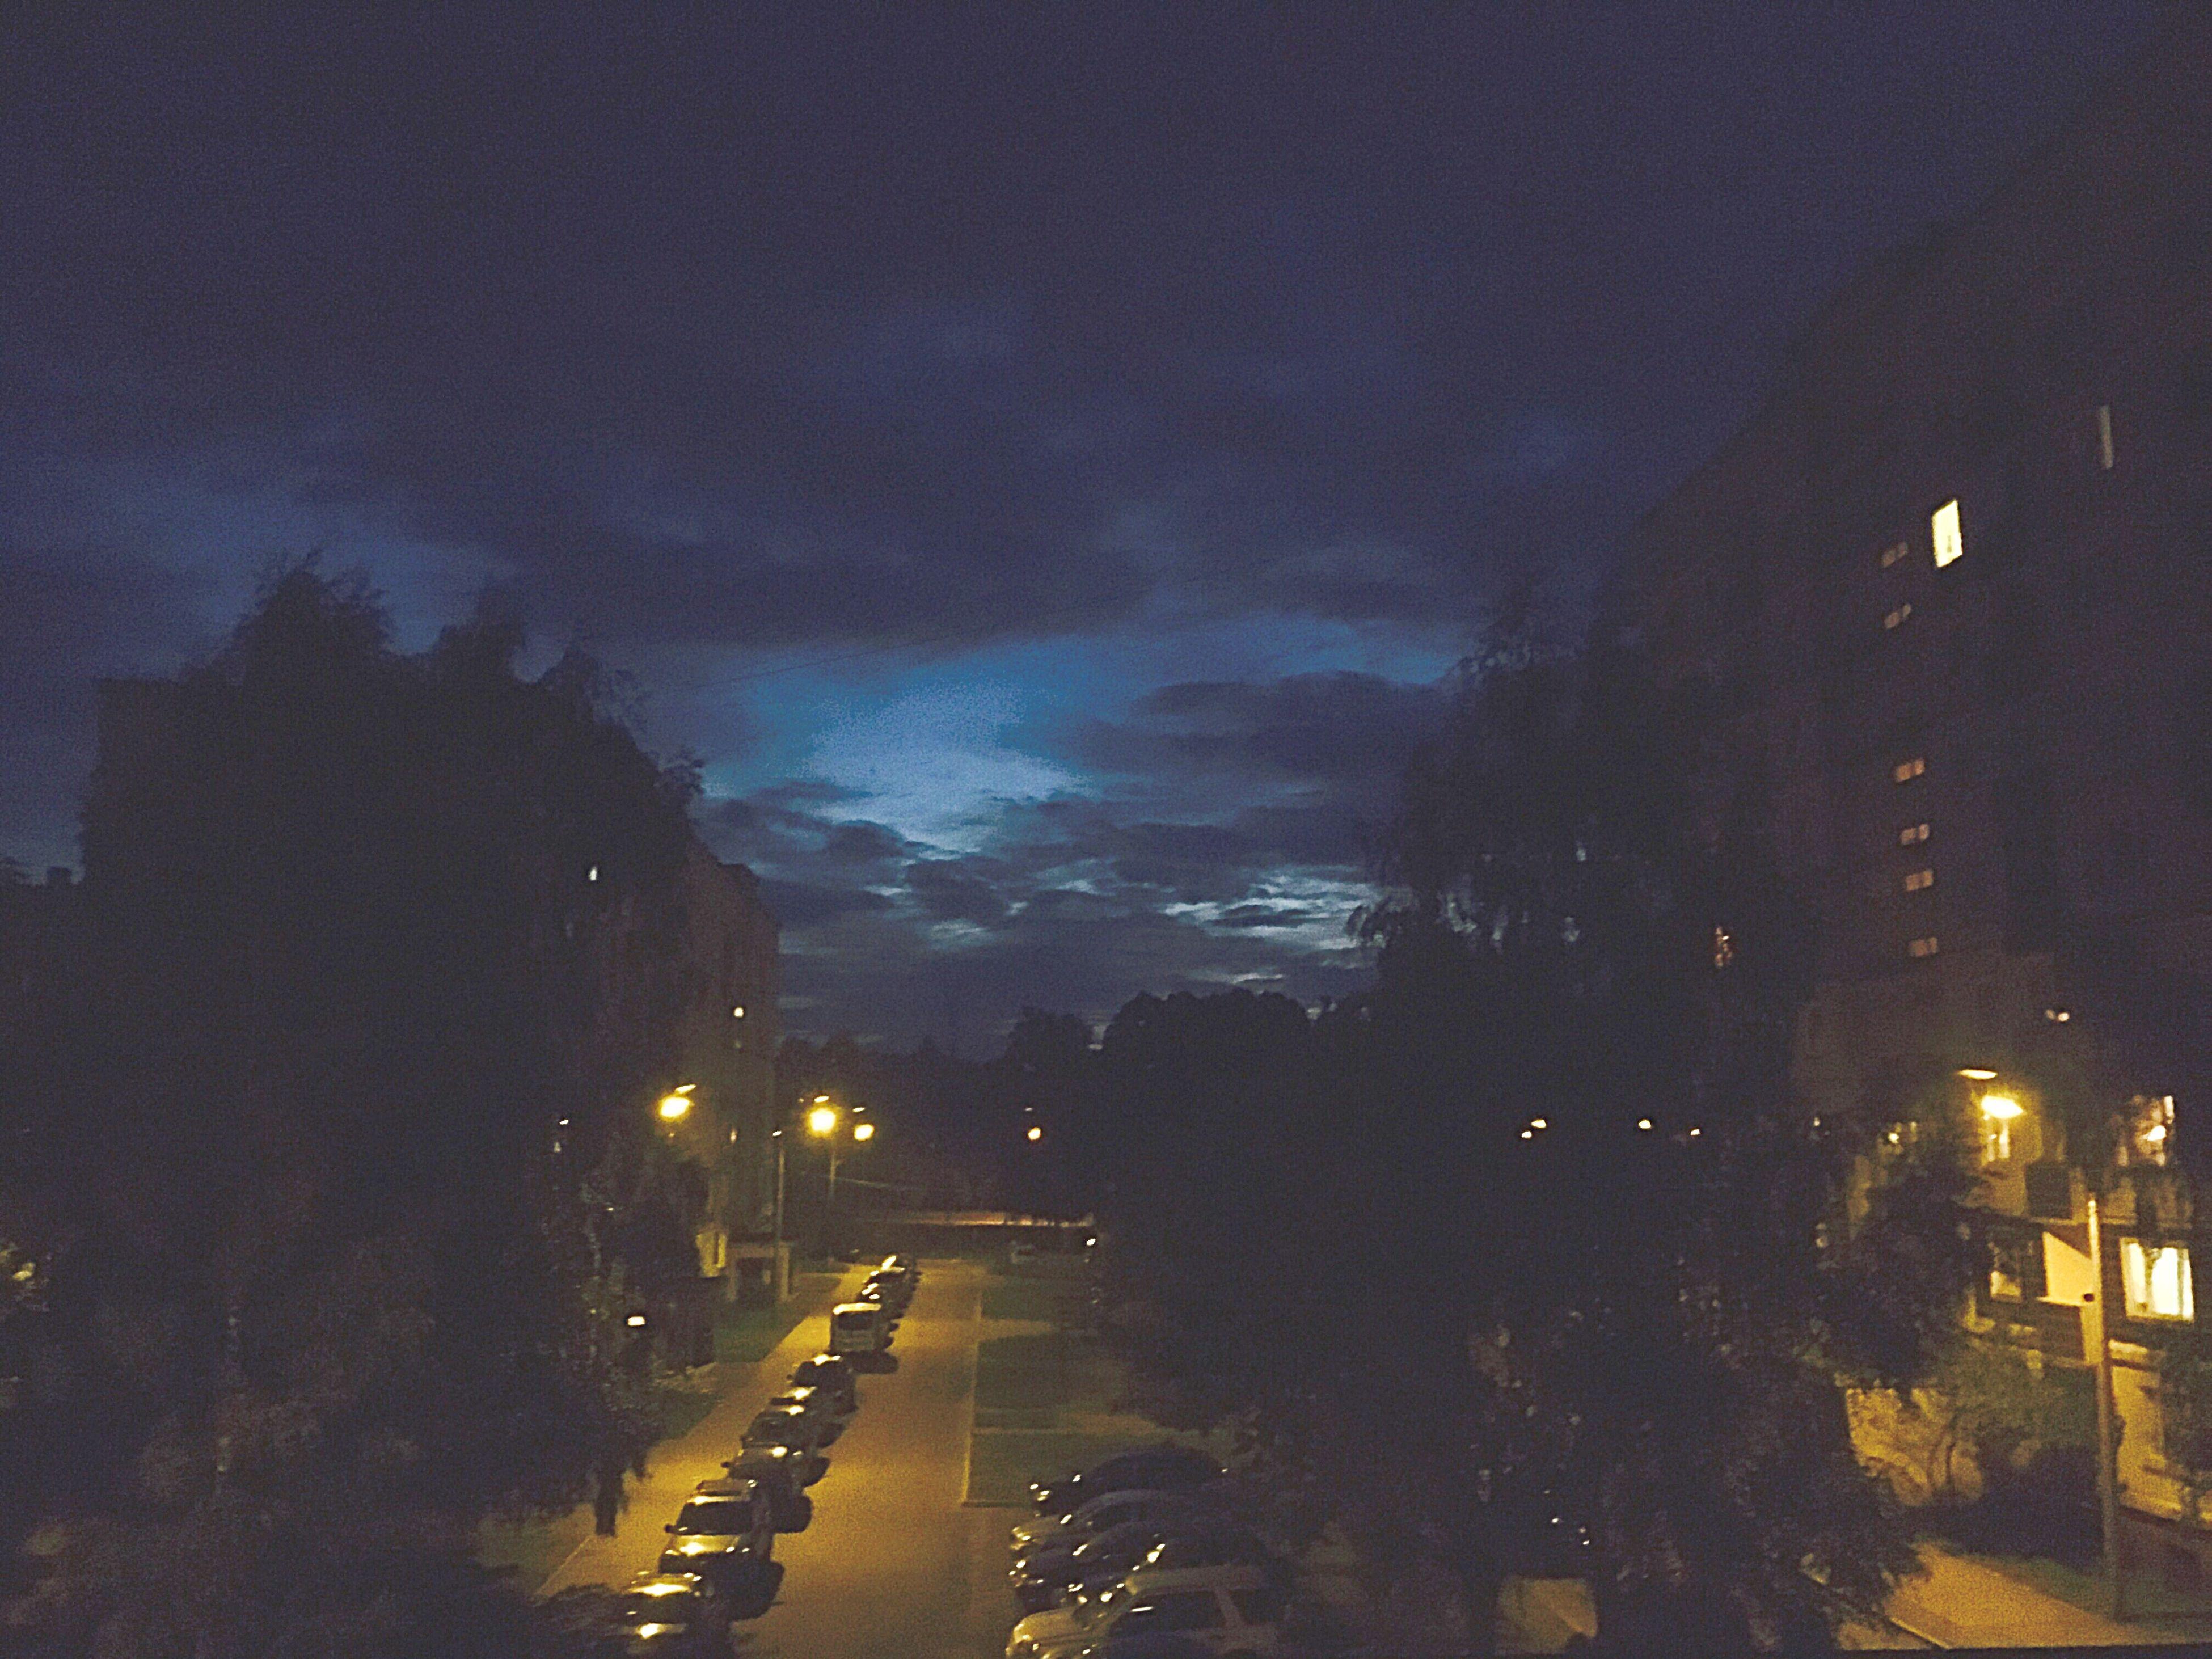 night, illuminated, sky, transportation, street, car, water, road, mode of transport, street light, built structure, building exterior, land vehicle, city, dusk, weather, architecture, wet, lighting equipment, rain